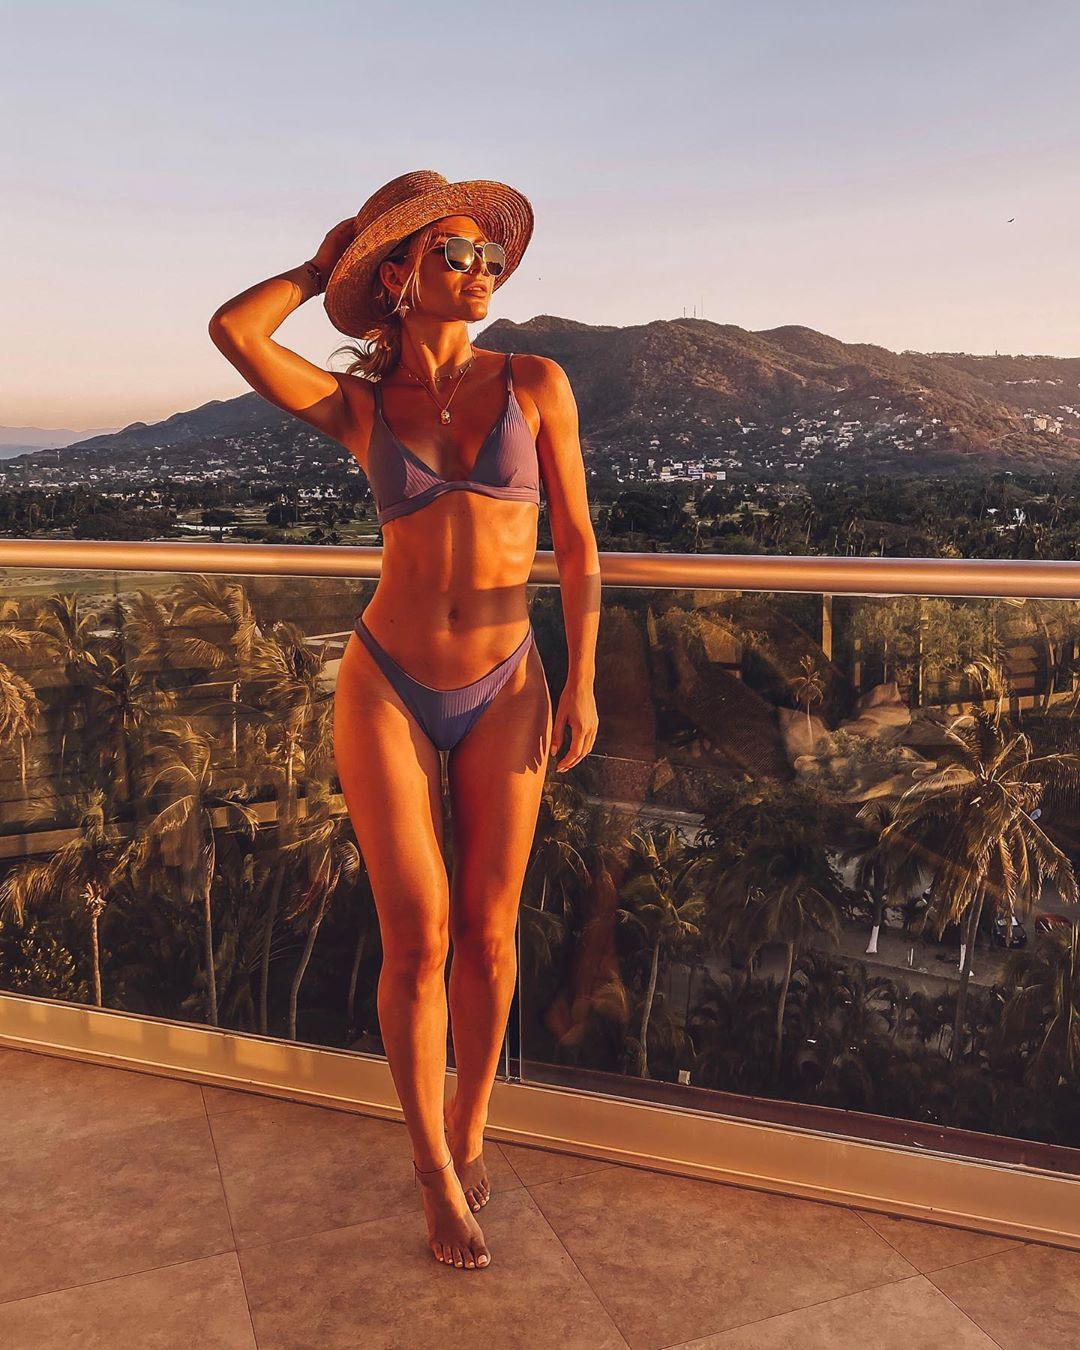 Irina Baeva bikini style outfit, girls instgram photography, sexy leg picture